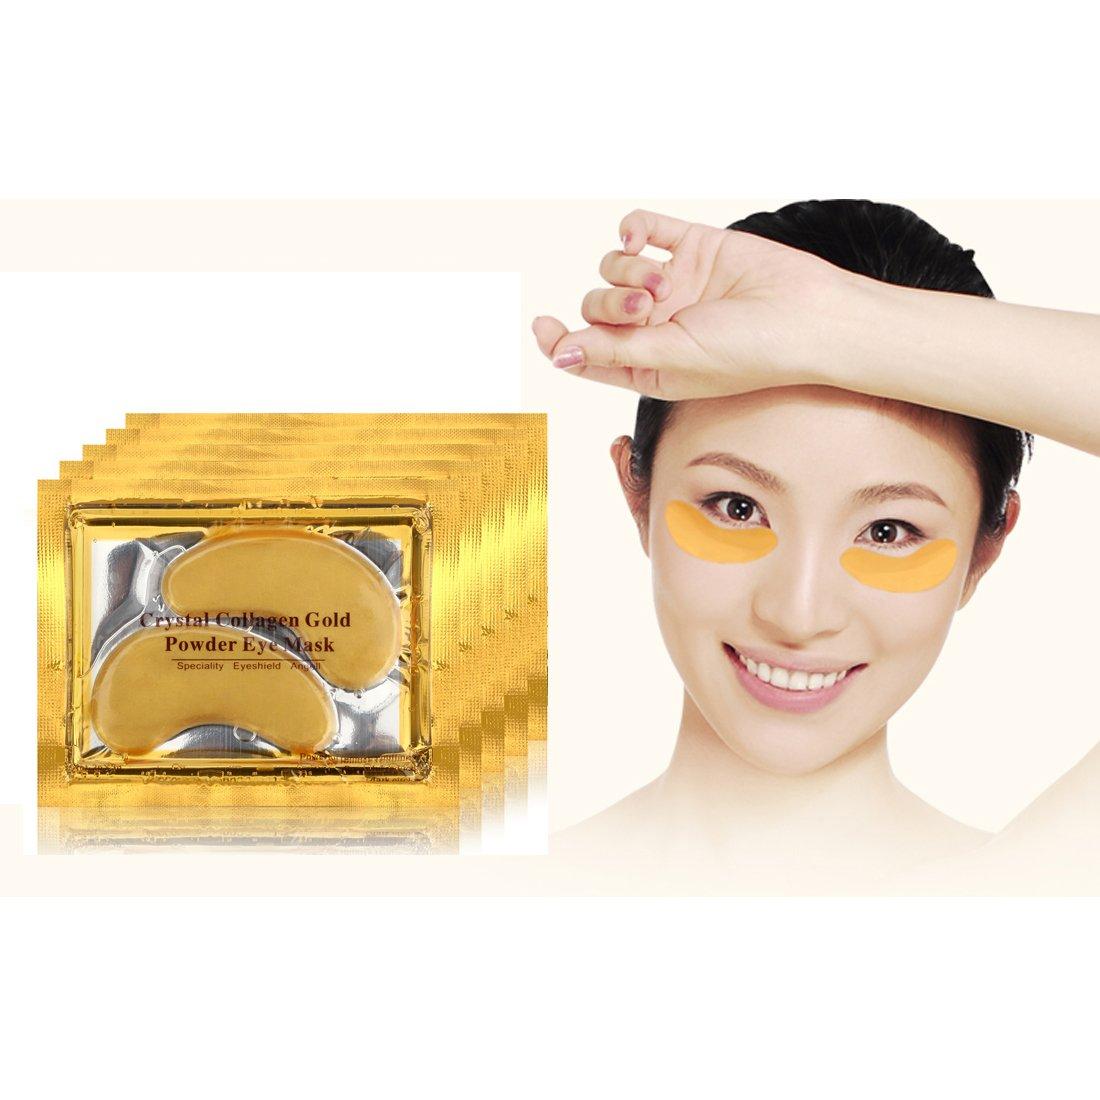 30 Pairs 24K Gold Powder Gel Collagen Eye Mask Masks Sheet Patch Beauty Tools MQ